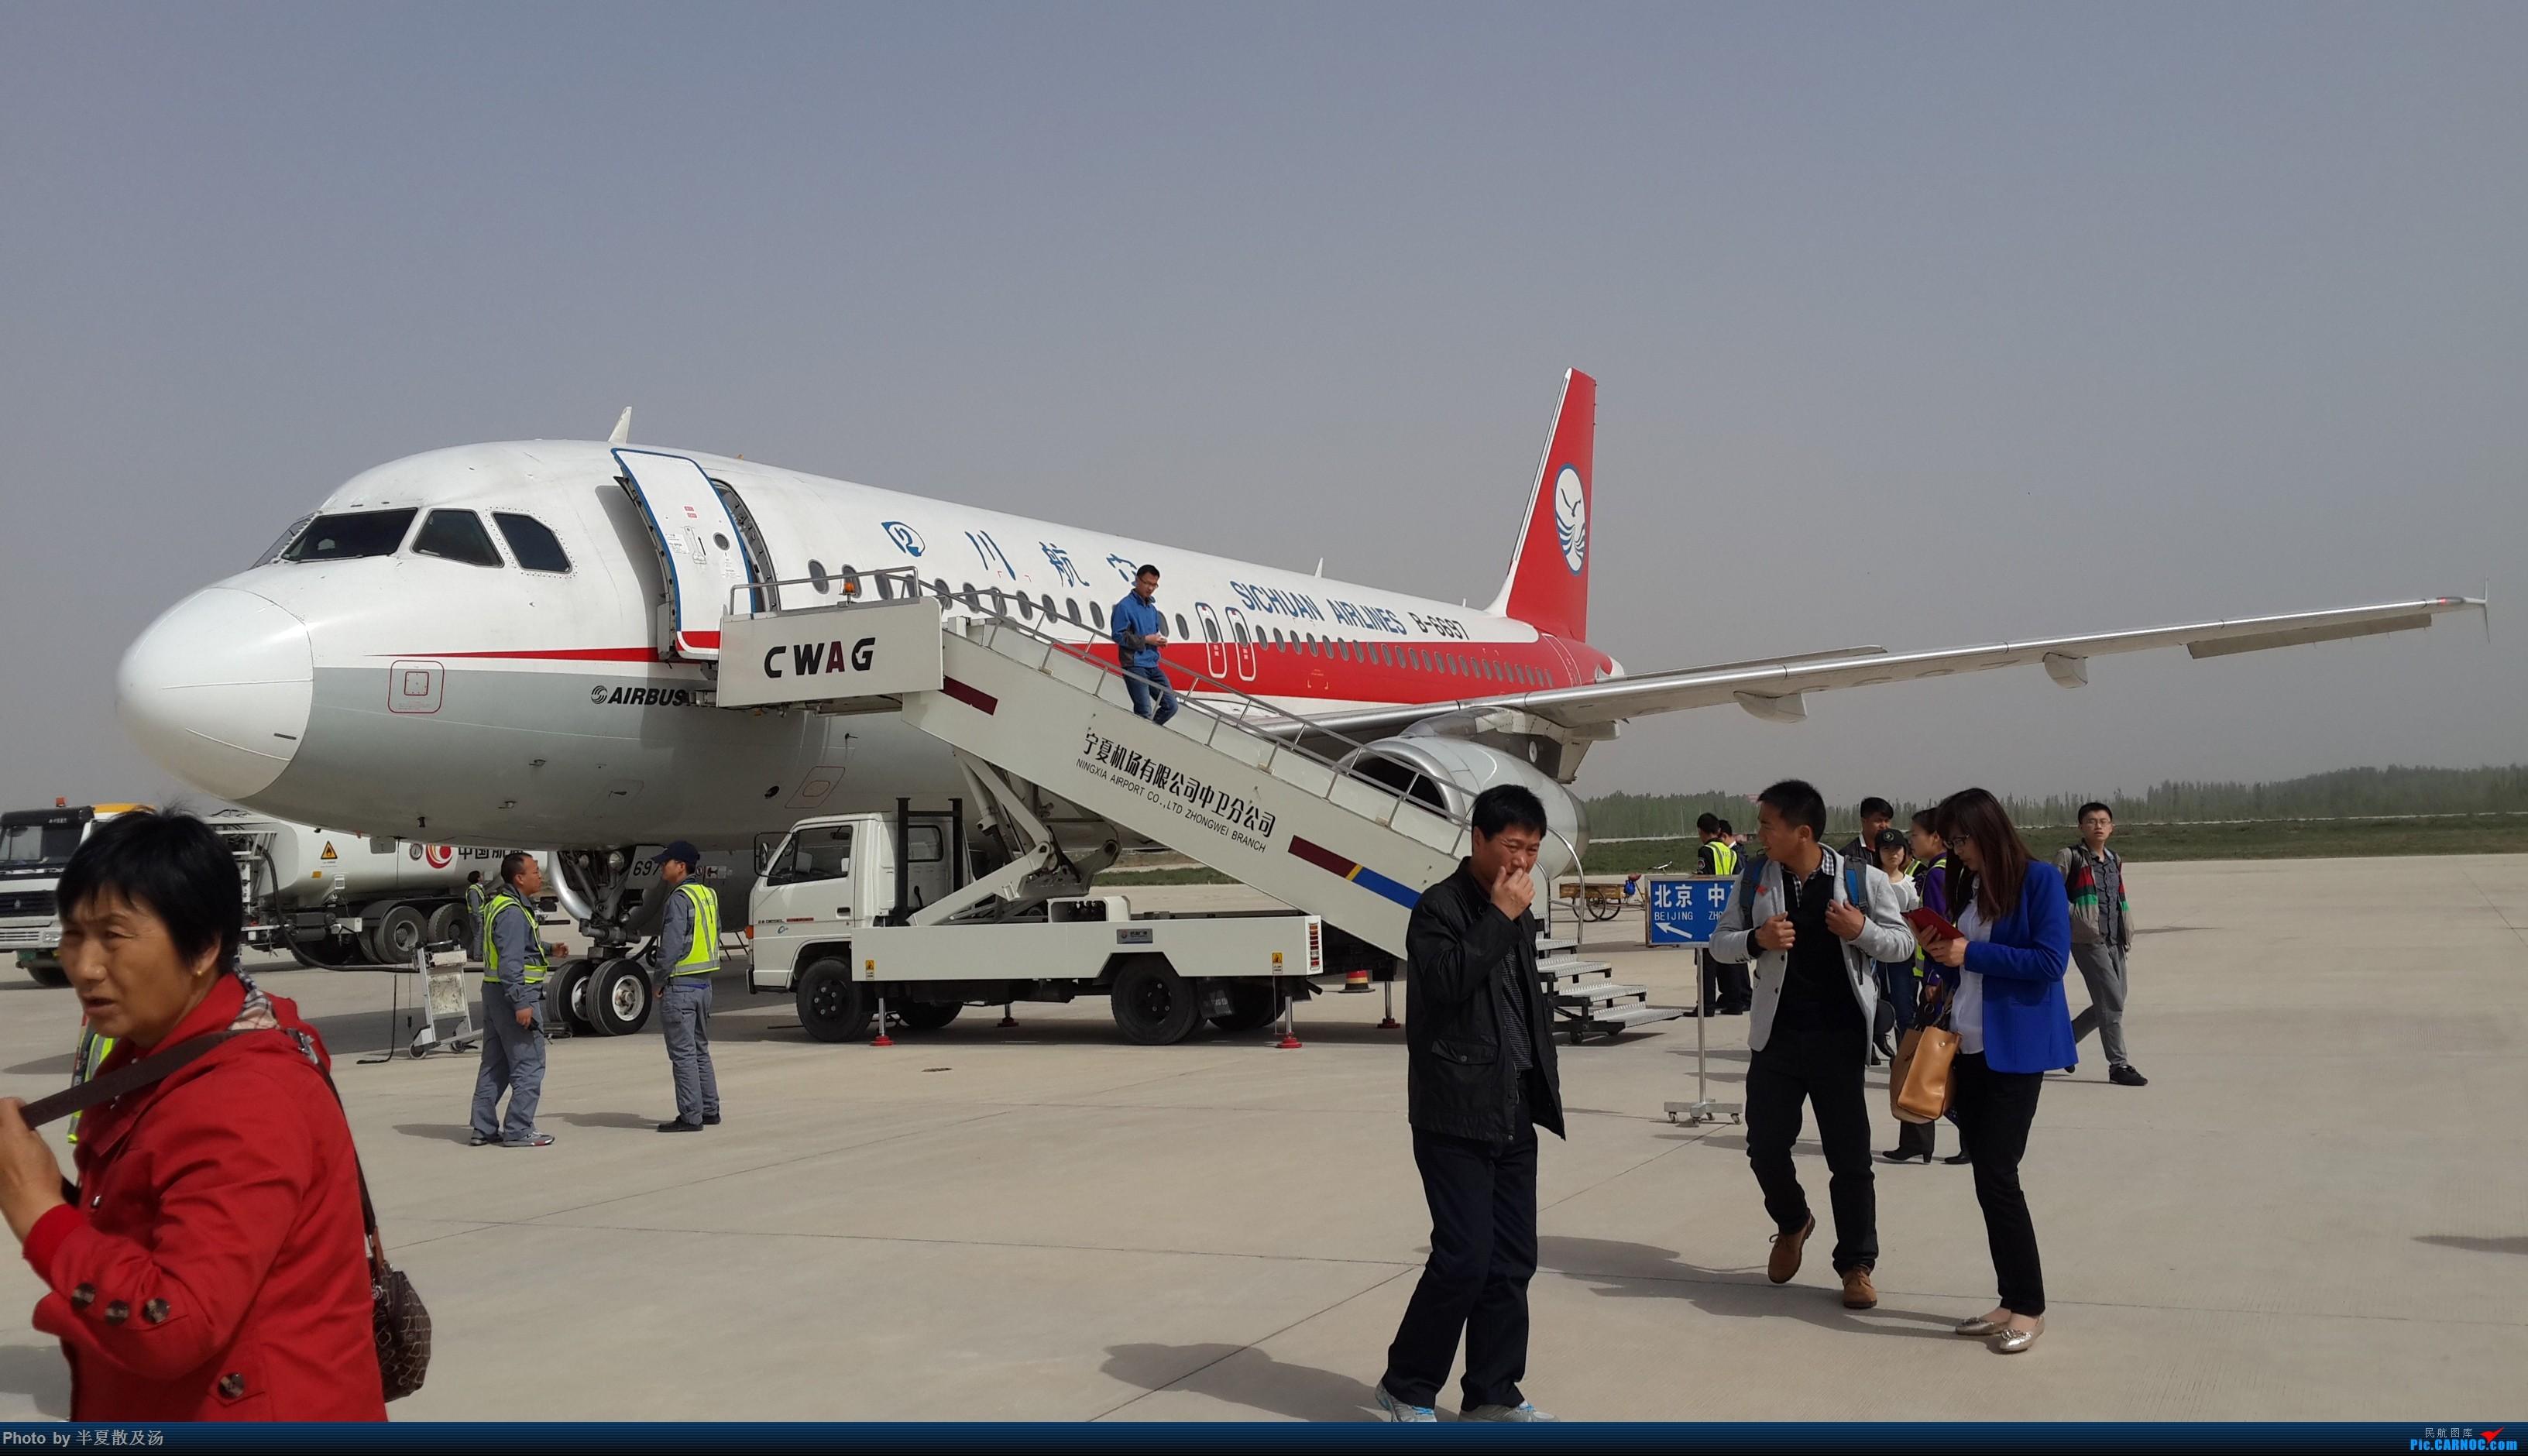 Re:[原创]A380主轮降温作业,道格拉斯抱轮车,747、330,多图 AIRBUS A320-200 B-6697 中国中卫沙坡头机场